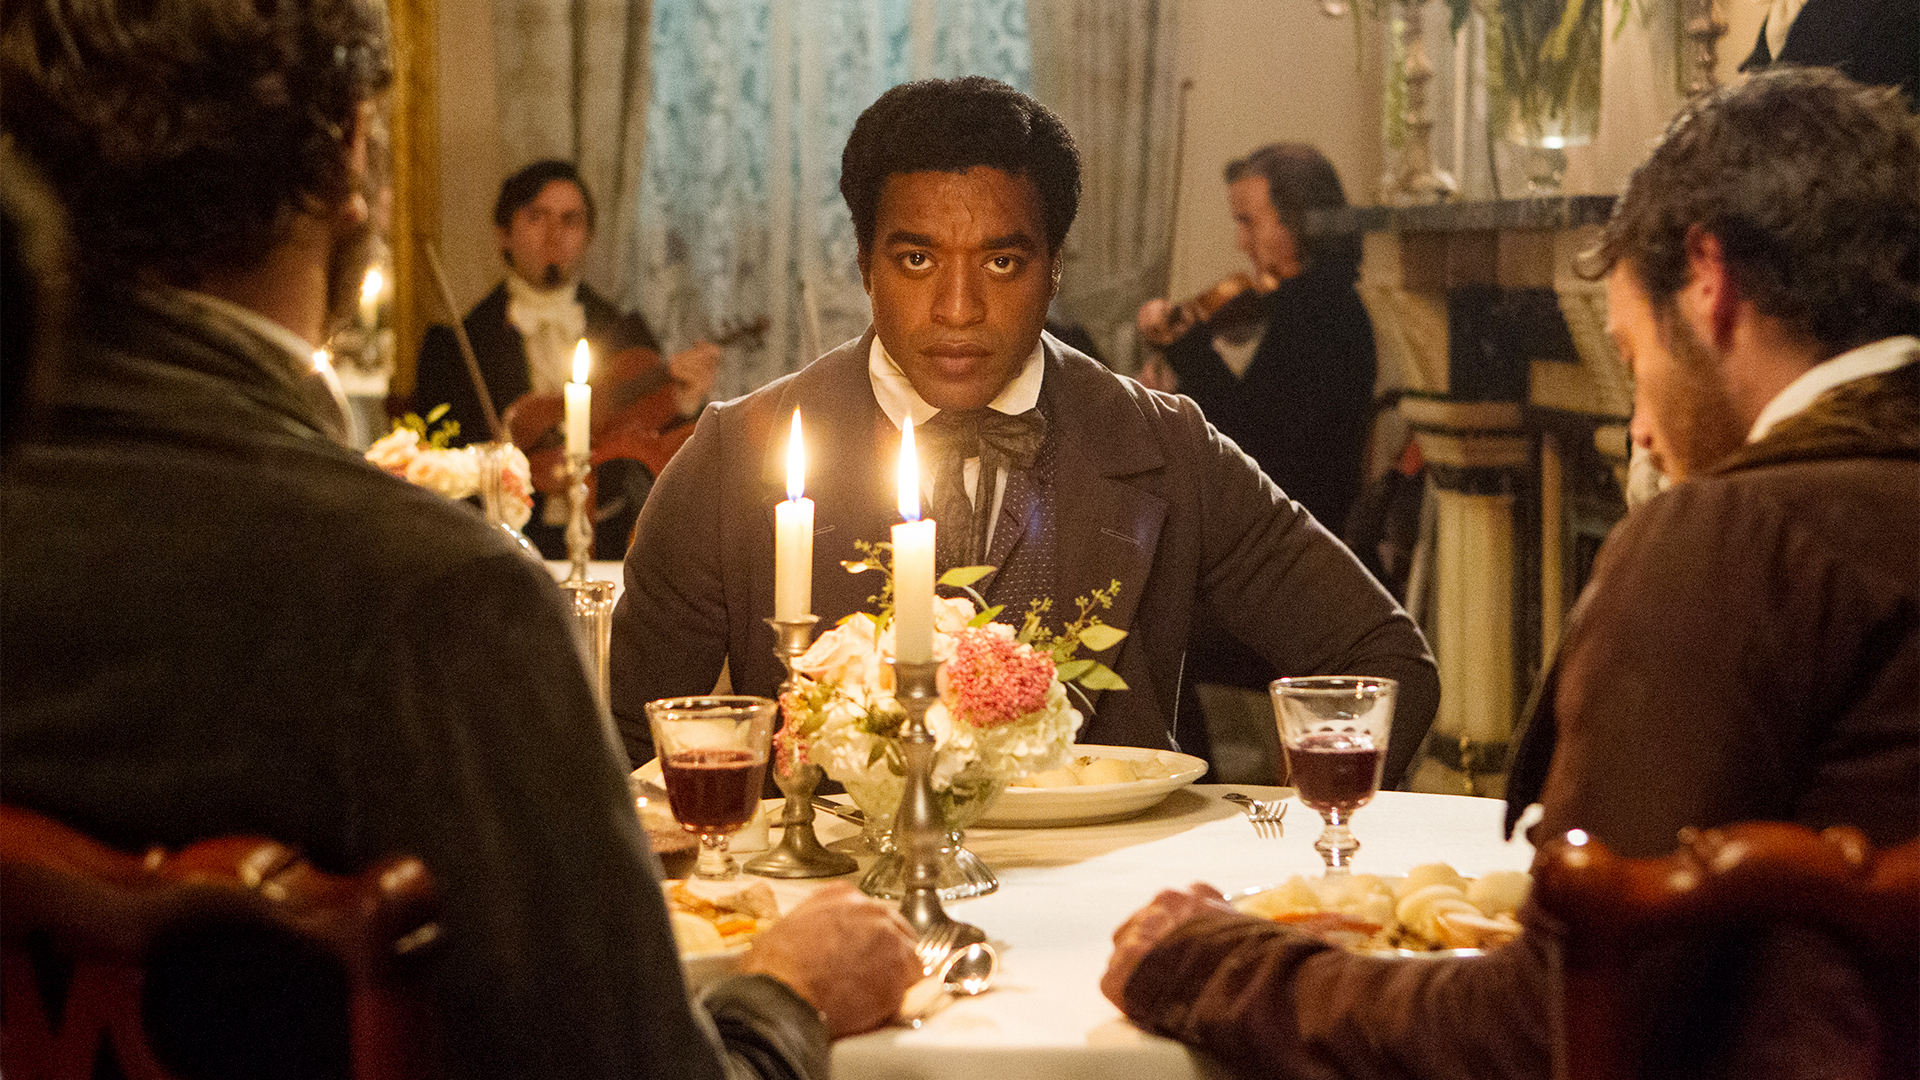 Toronto International Film Festival 2013: Steve McQueen's 12 Years a Slave